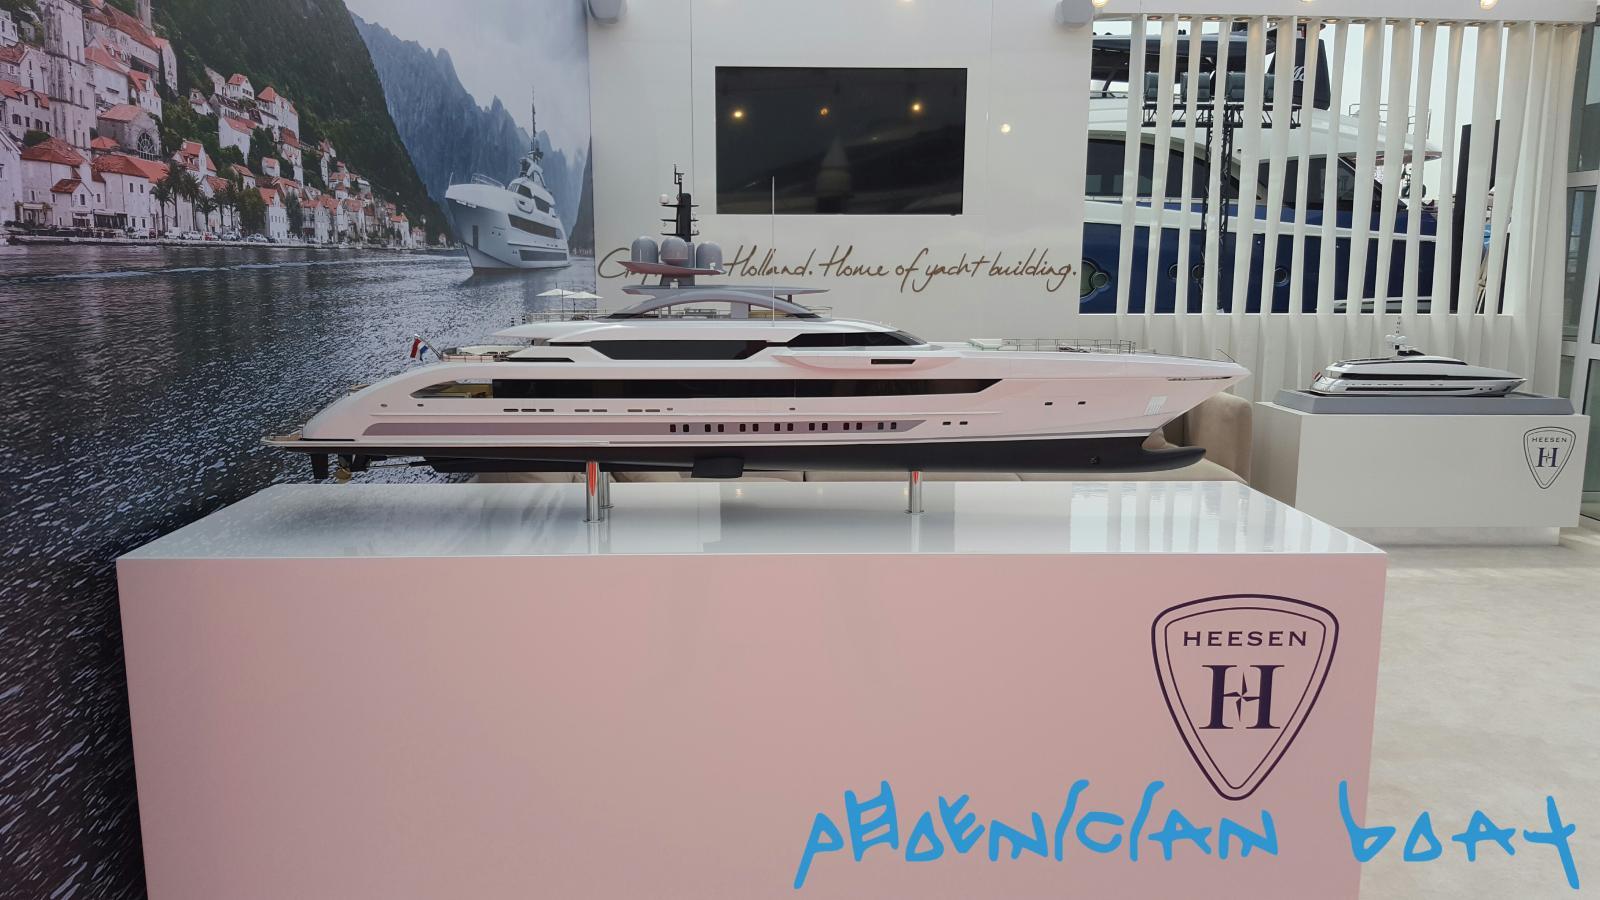 Dubai International Boat Show 2017